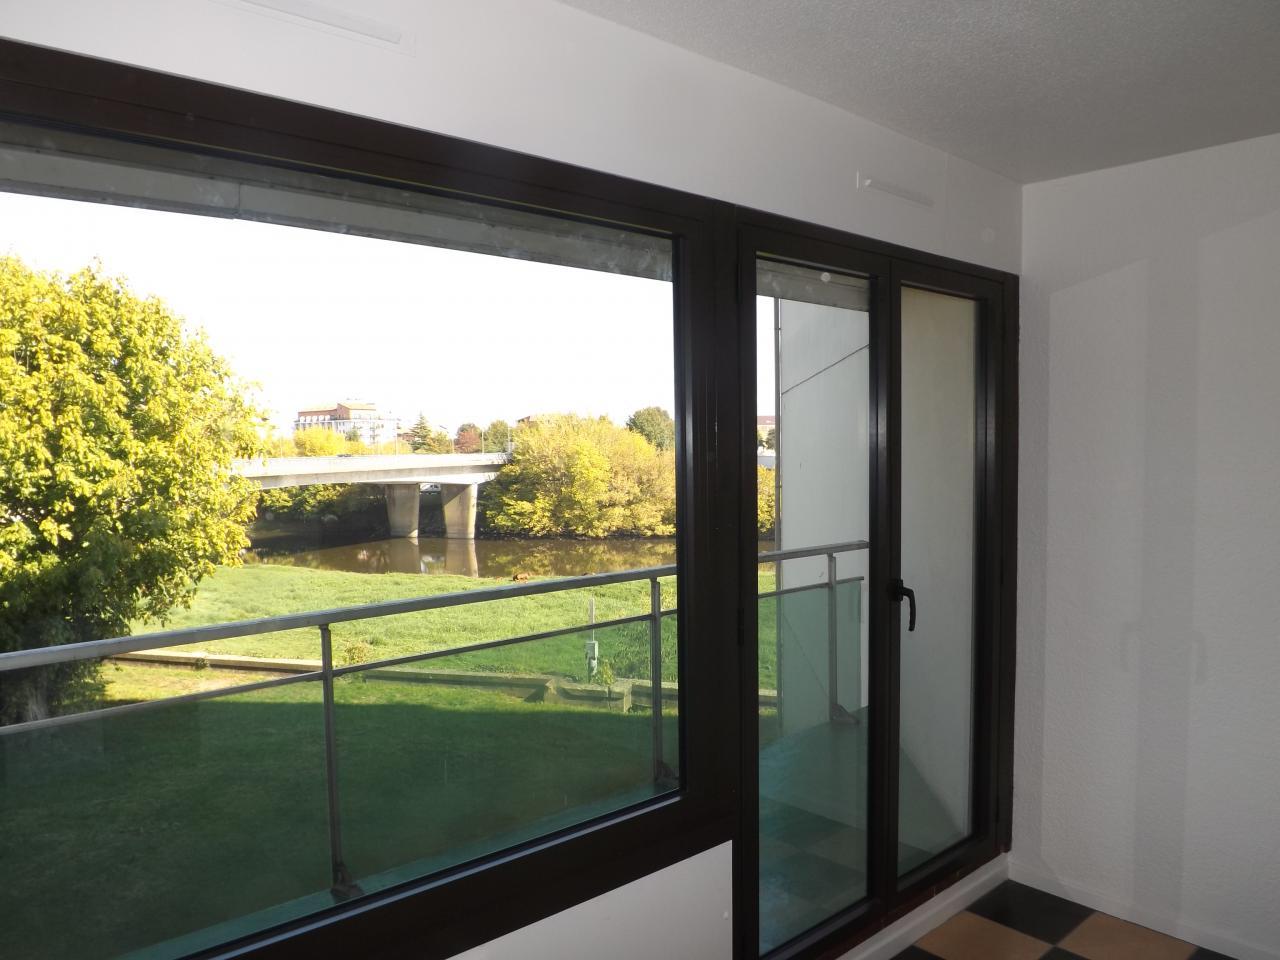 Baie Fixe + porte fenêtre en ALU marron foncé